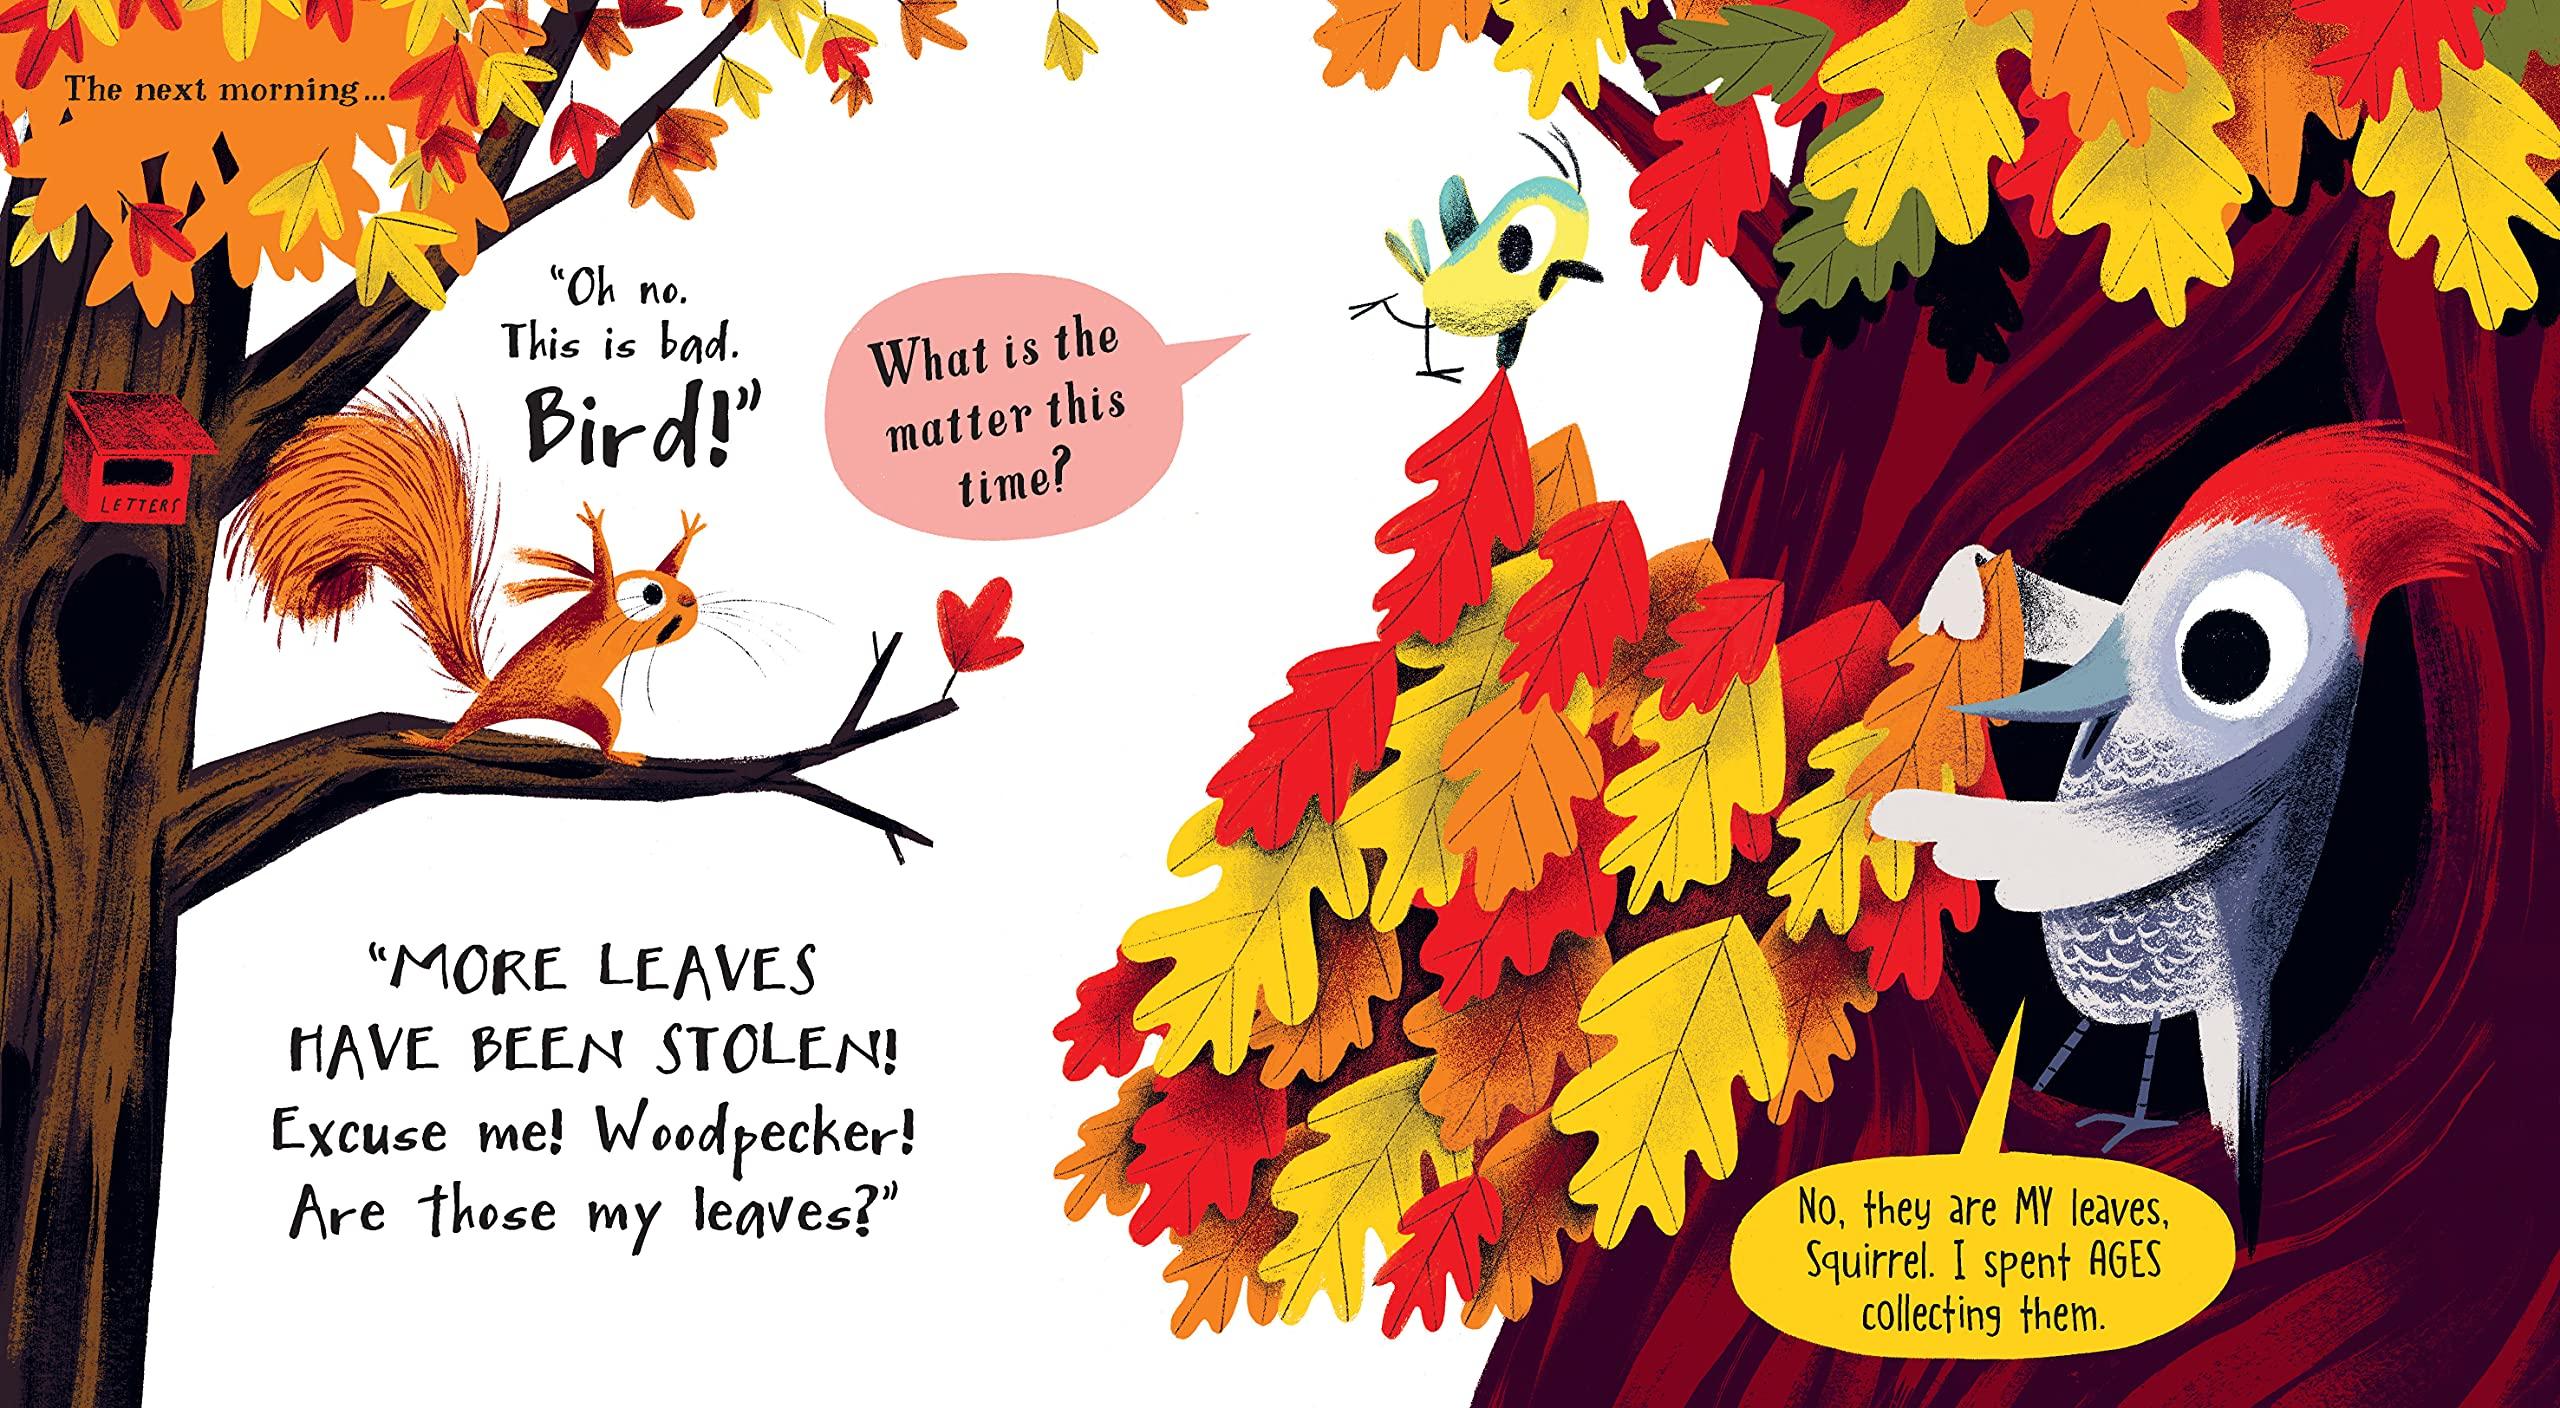 The Leaf Thief: Hemming, Alice, Slater, Nicola: 0760789305887: Amazon.com:  Books